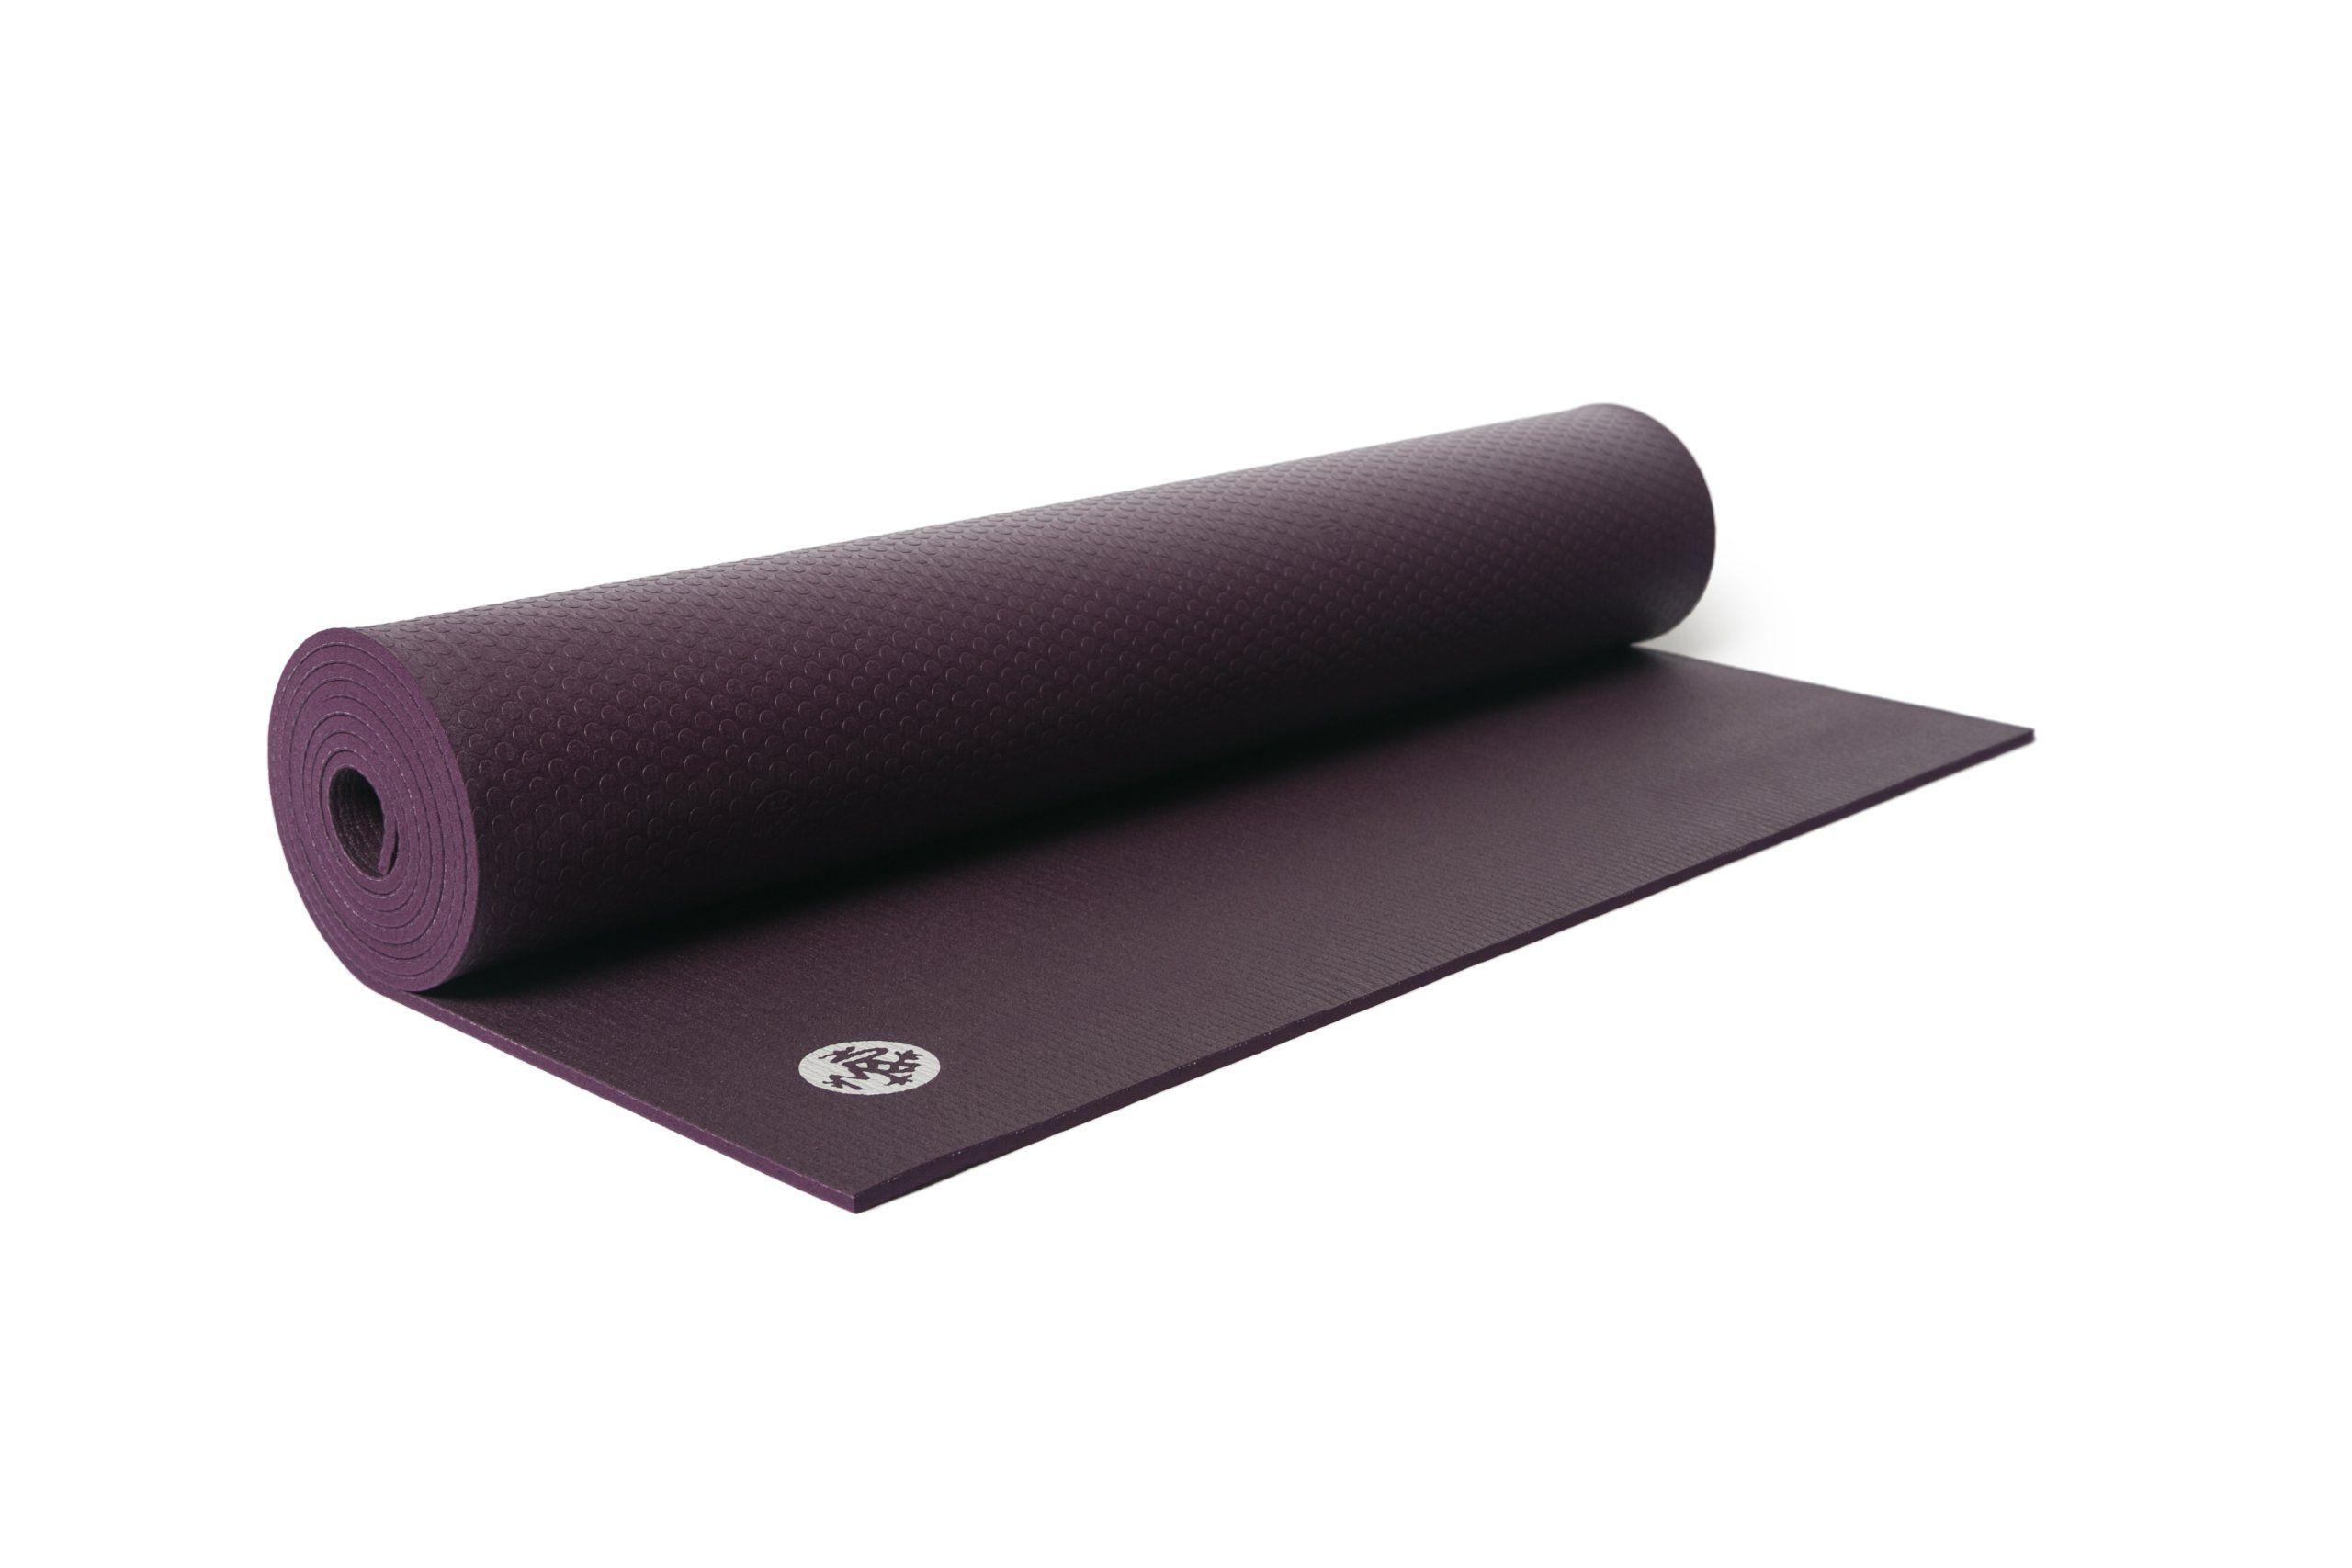 yoga eco cover jadeyoga professional best mat the mats gear friendly calendar harmony jade